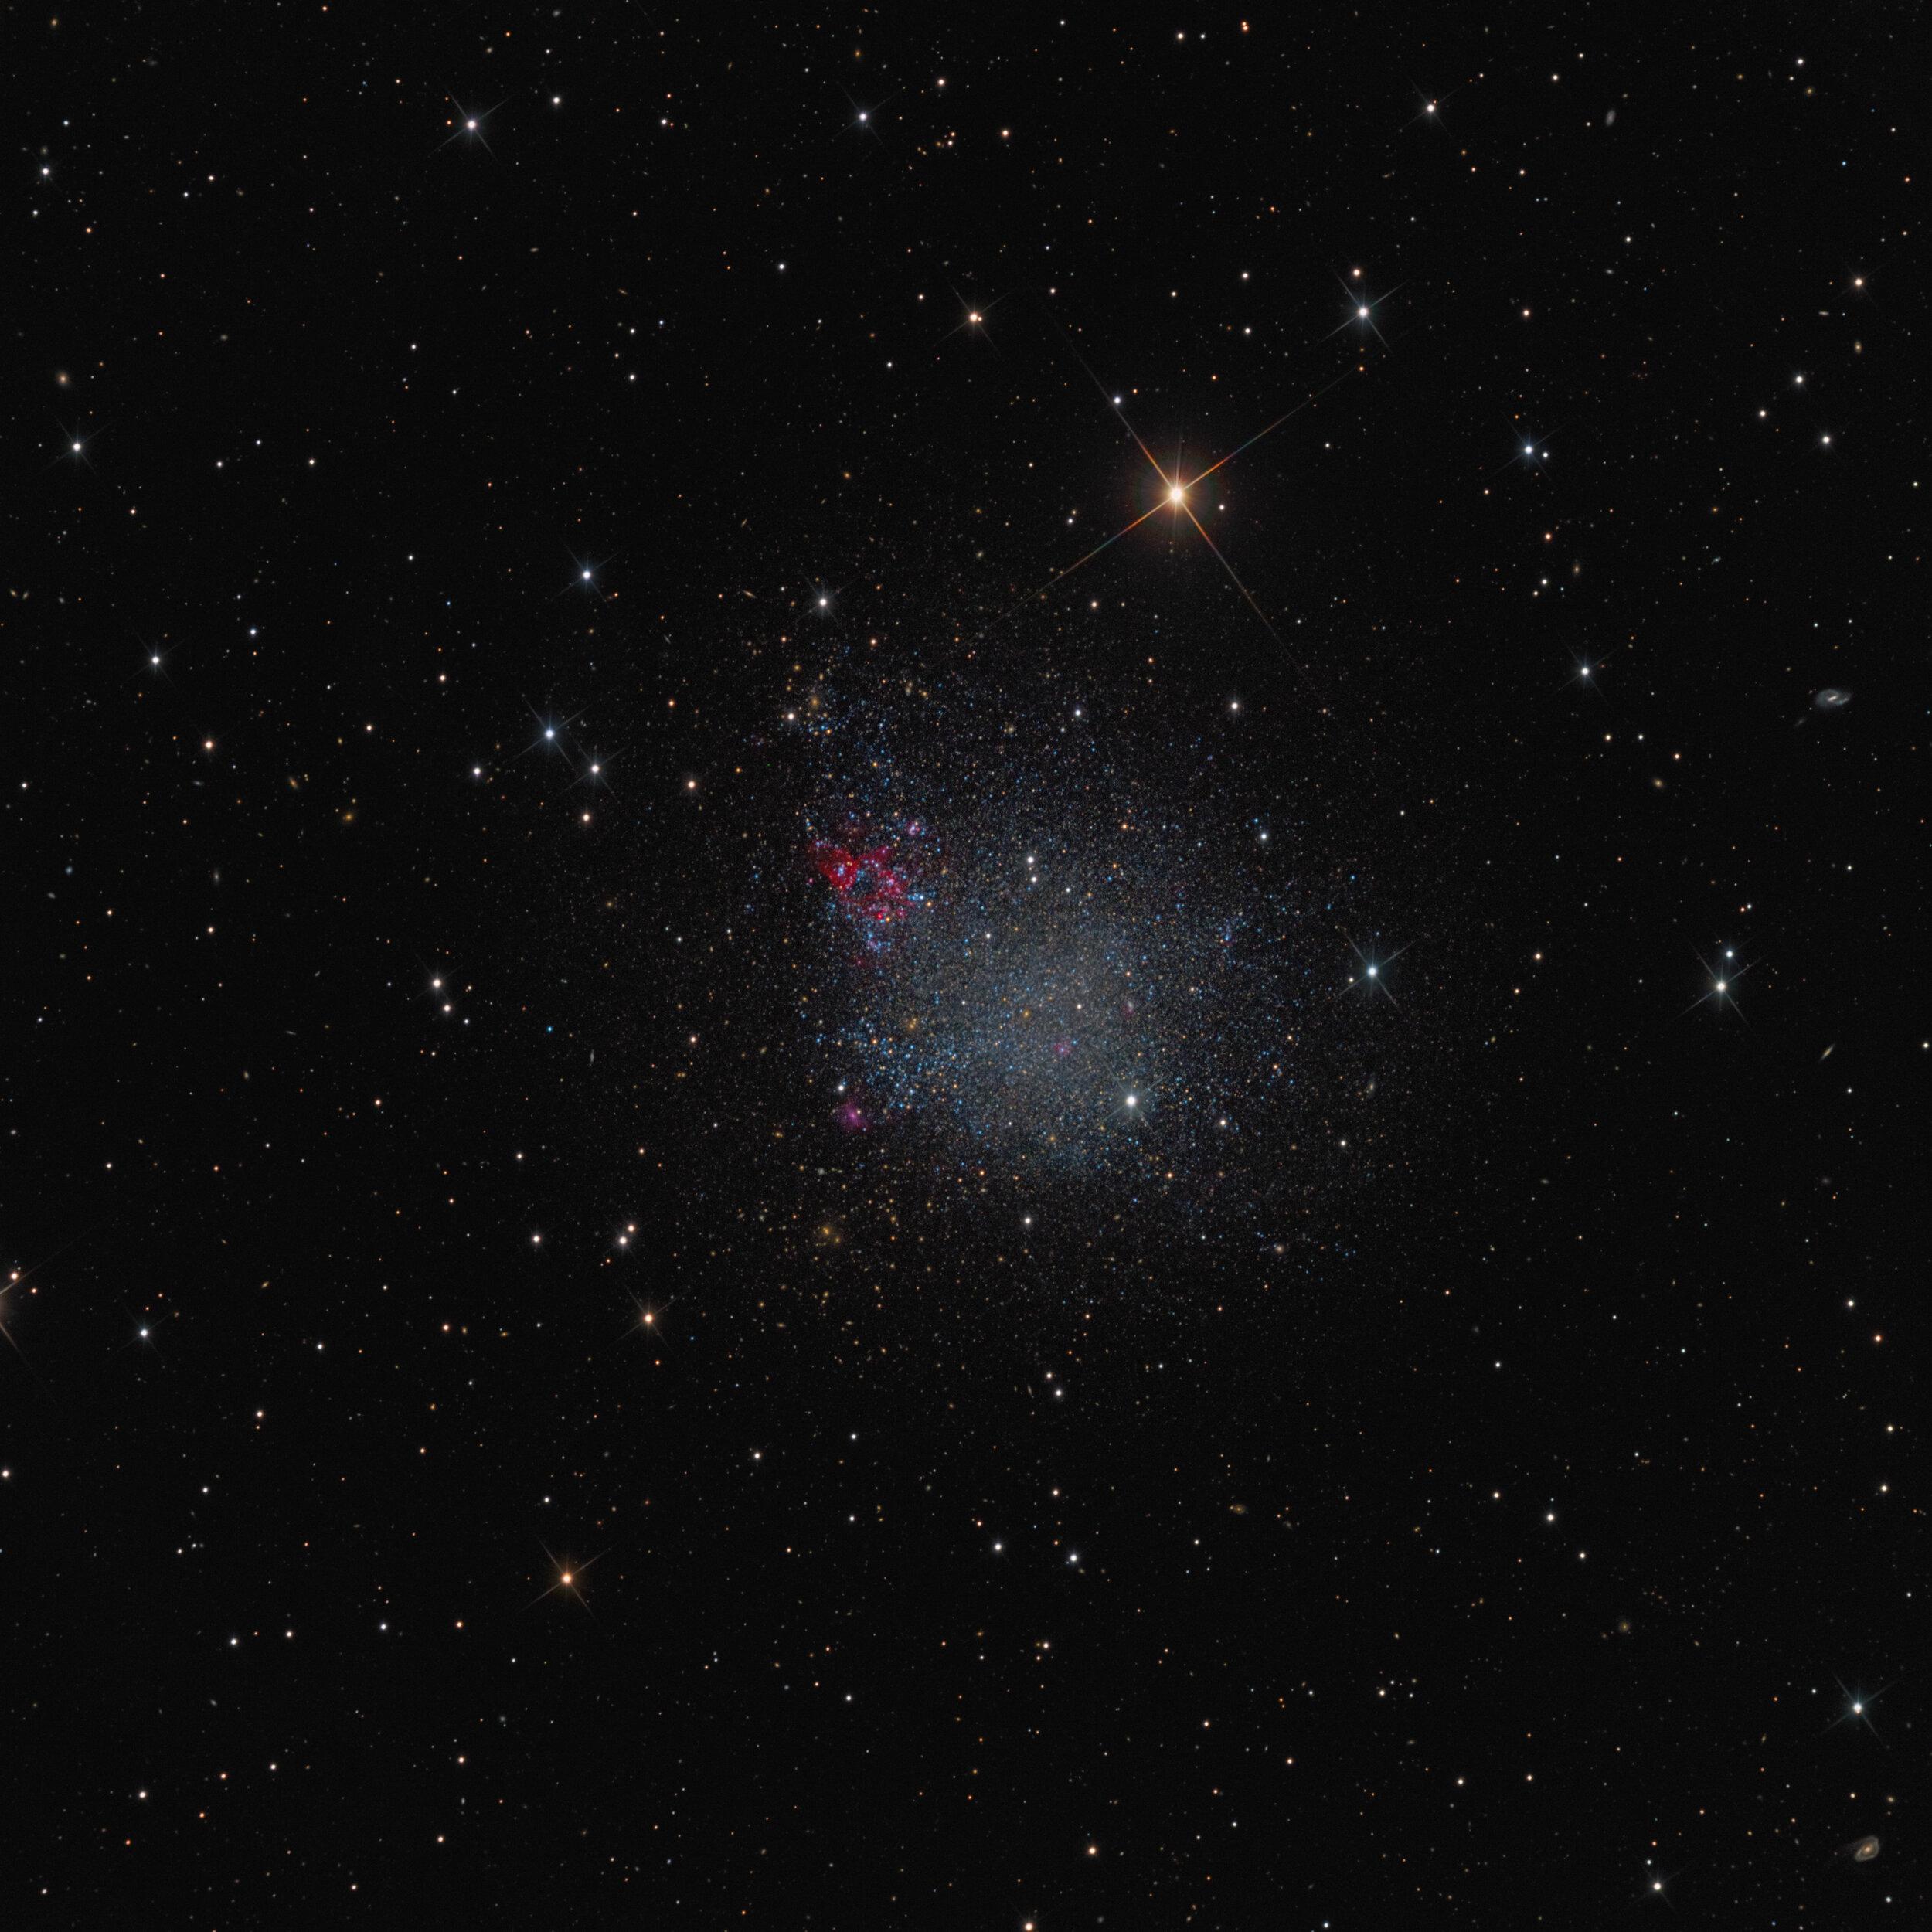 IC1613 Galaxy Astrophotography Martin Rusterholz